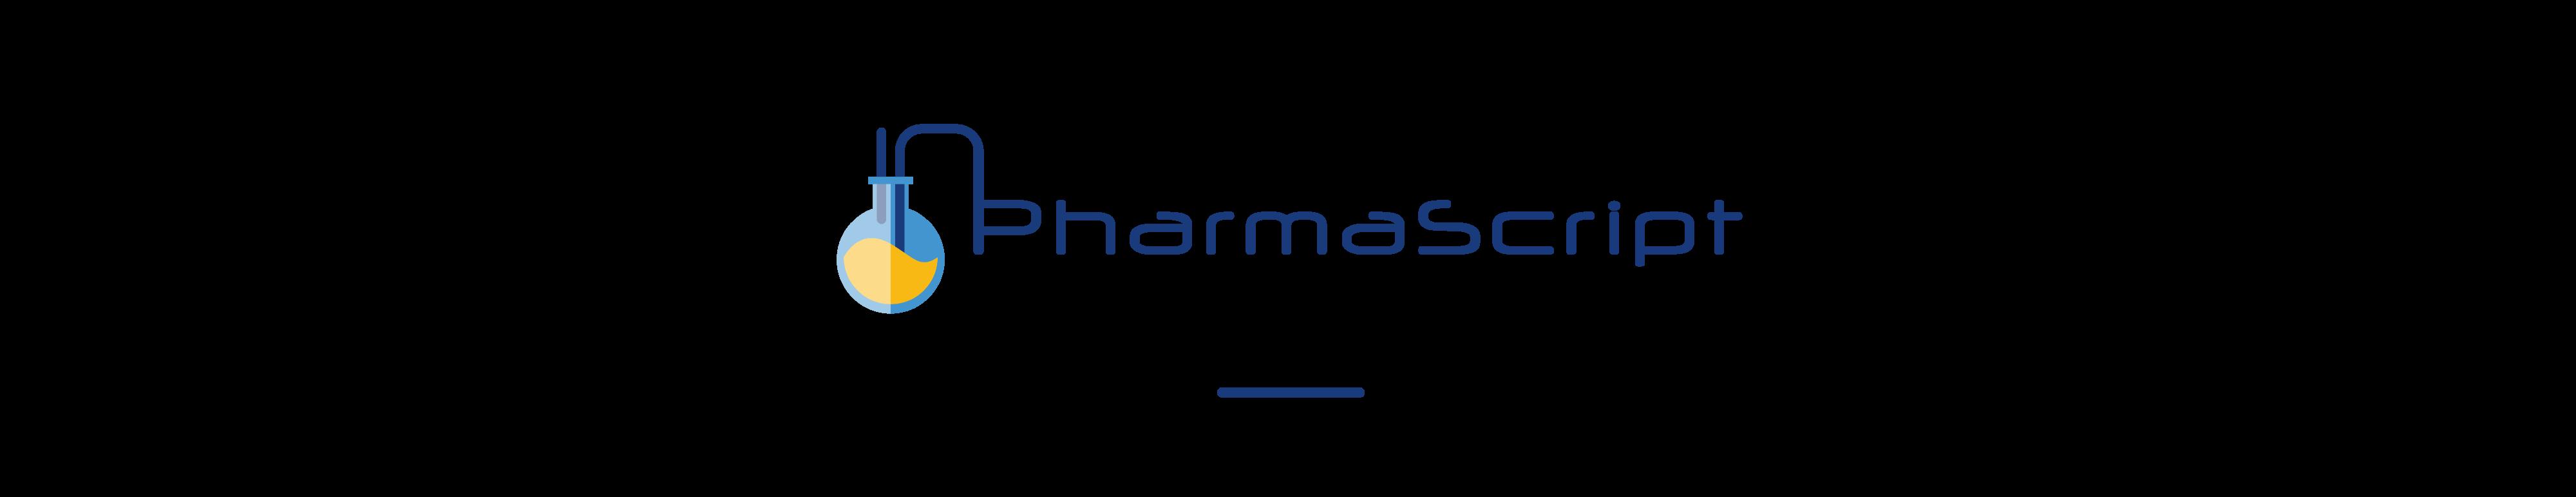 Pharmascript-ForWeb-01-01